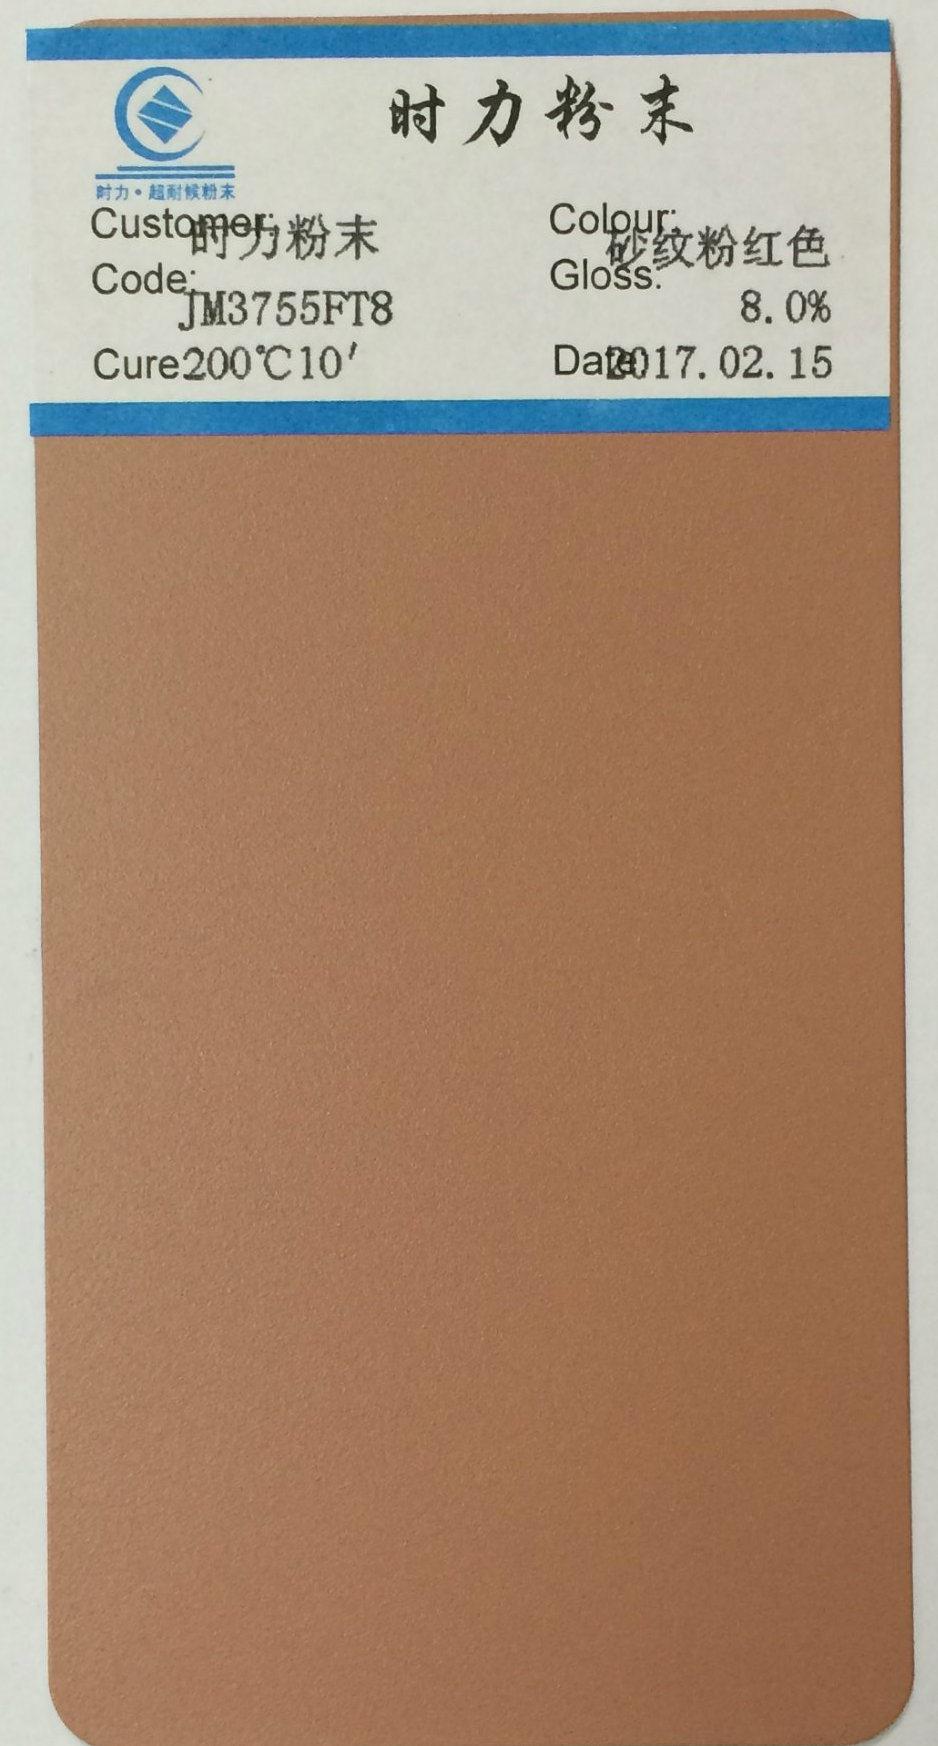 Jm3755FT8 8% Gloss Pink Powder Paint Powder Coating